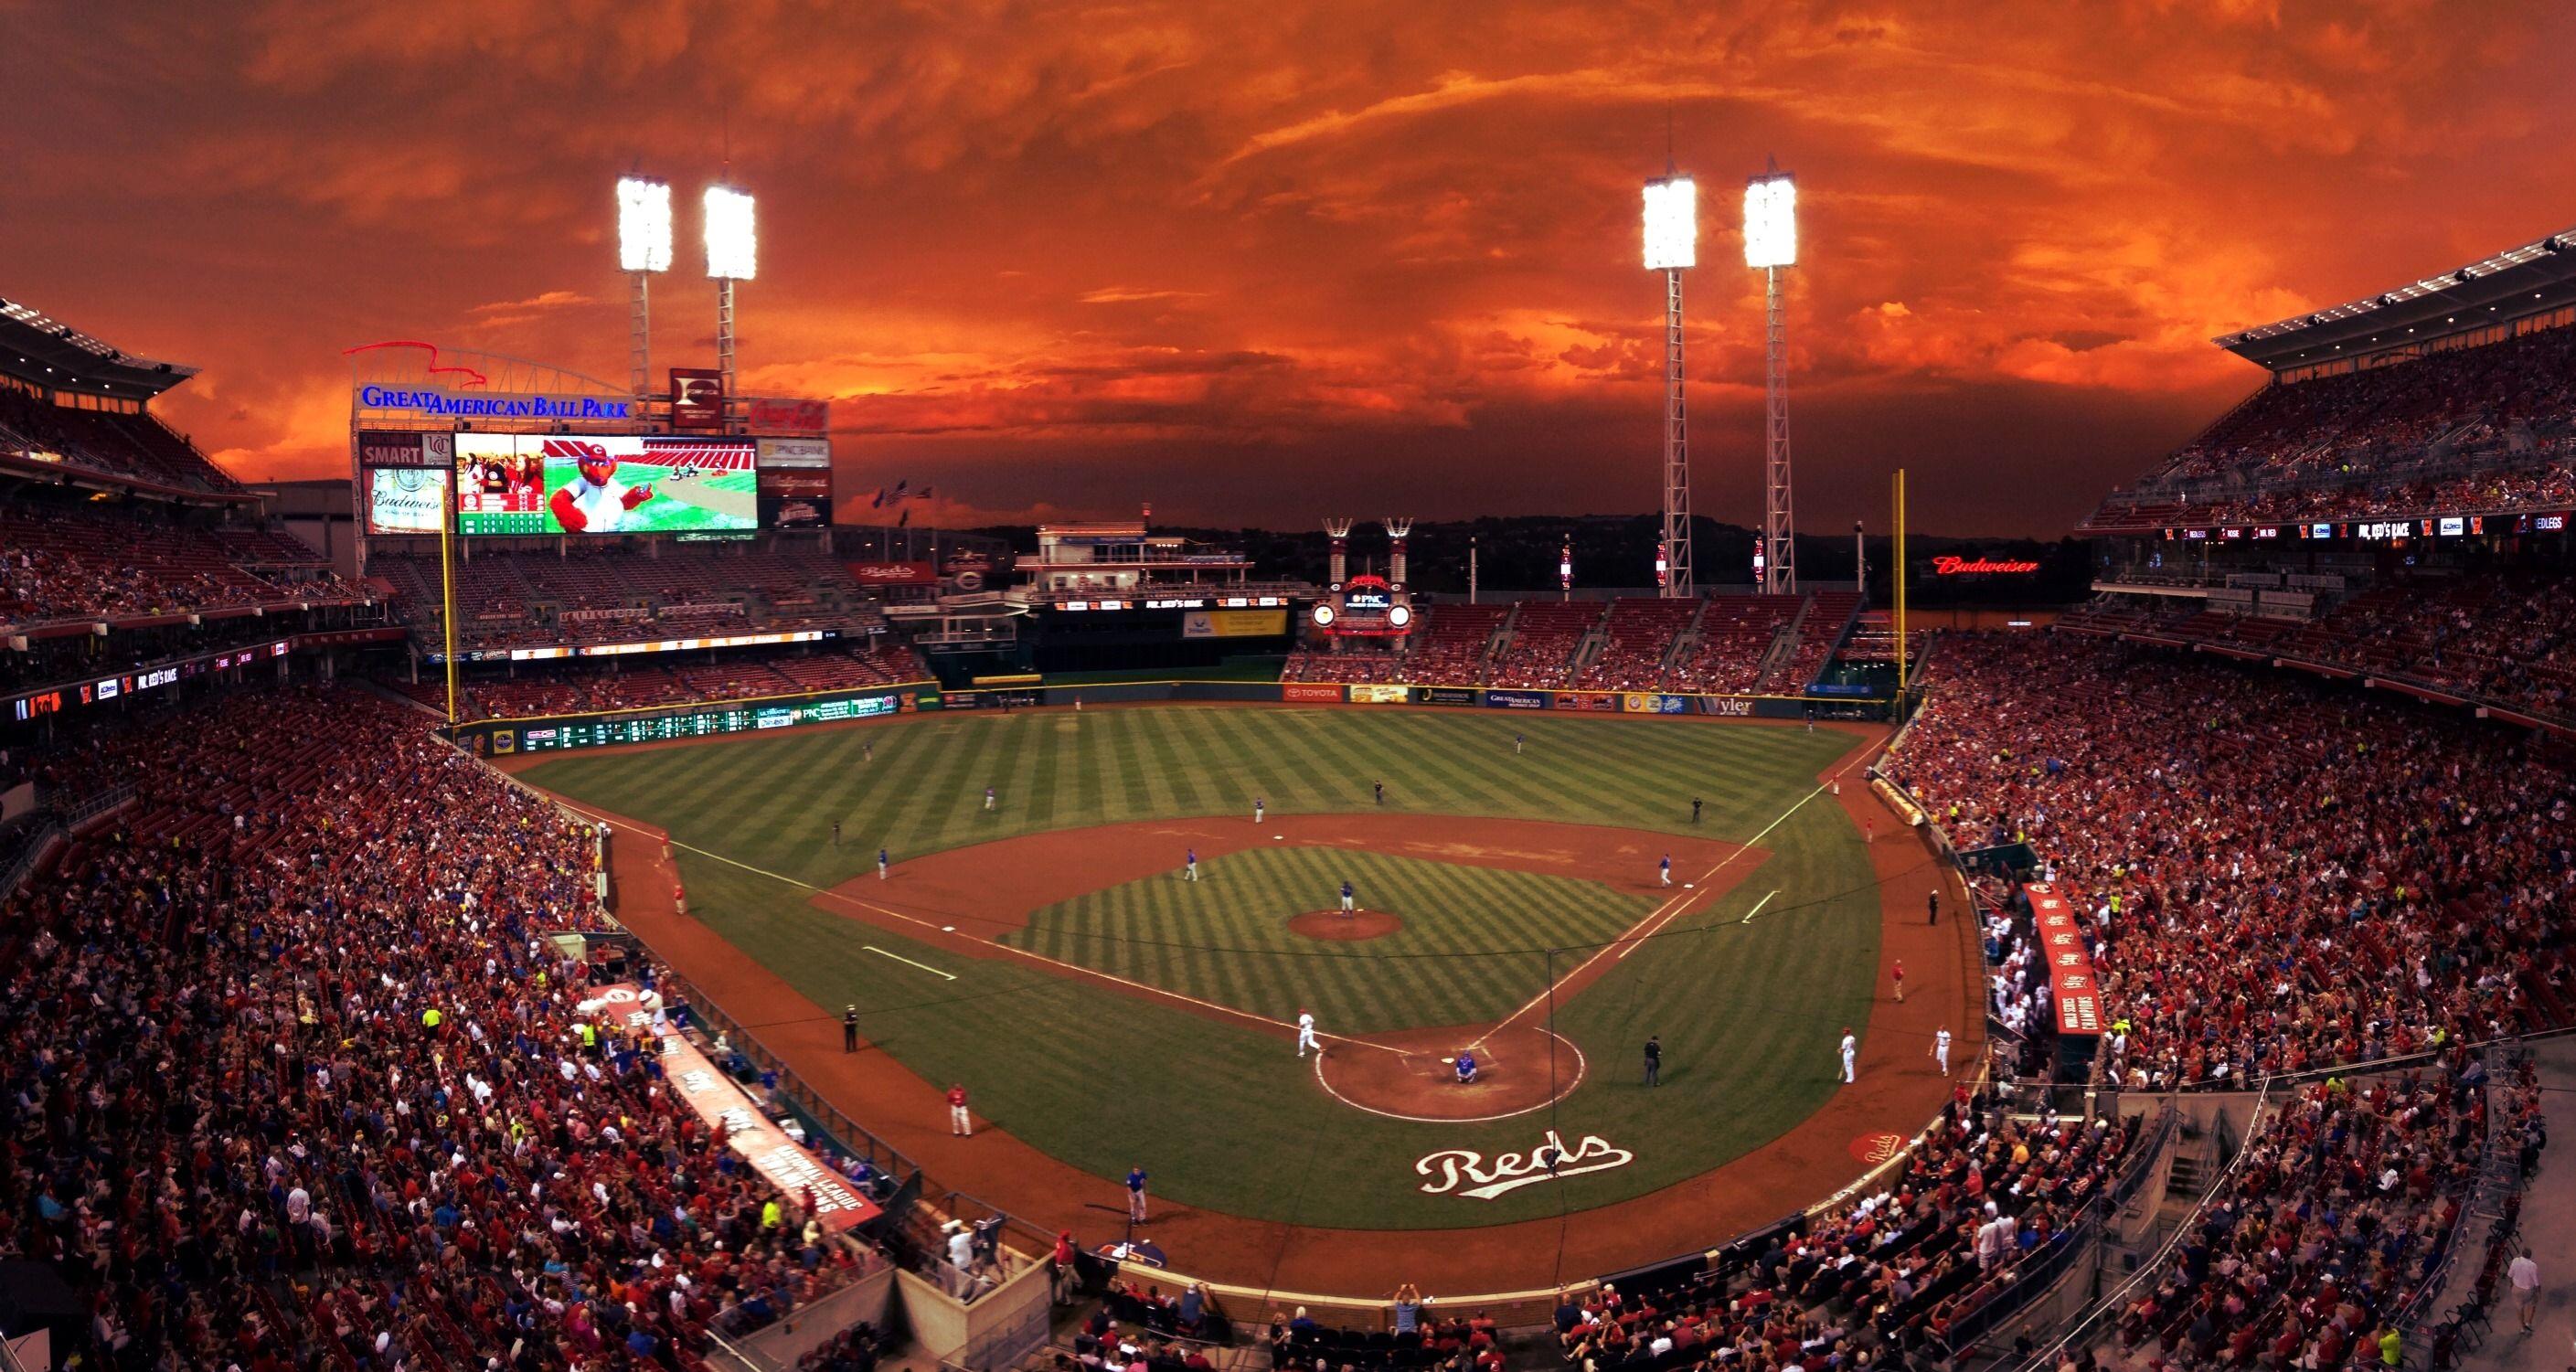 Great American Ballpark At Night Google Search Cincinnati Reds Game Cincinnati Reds Reds Game